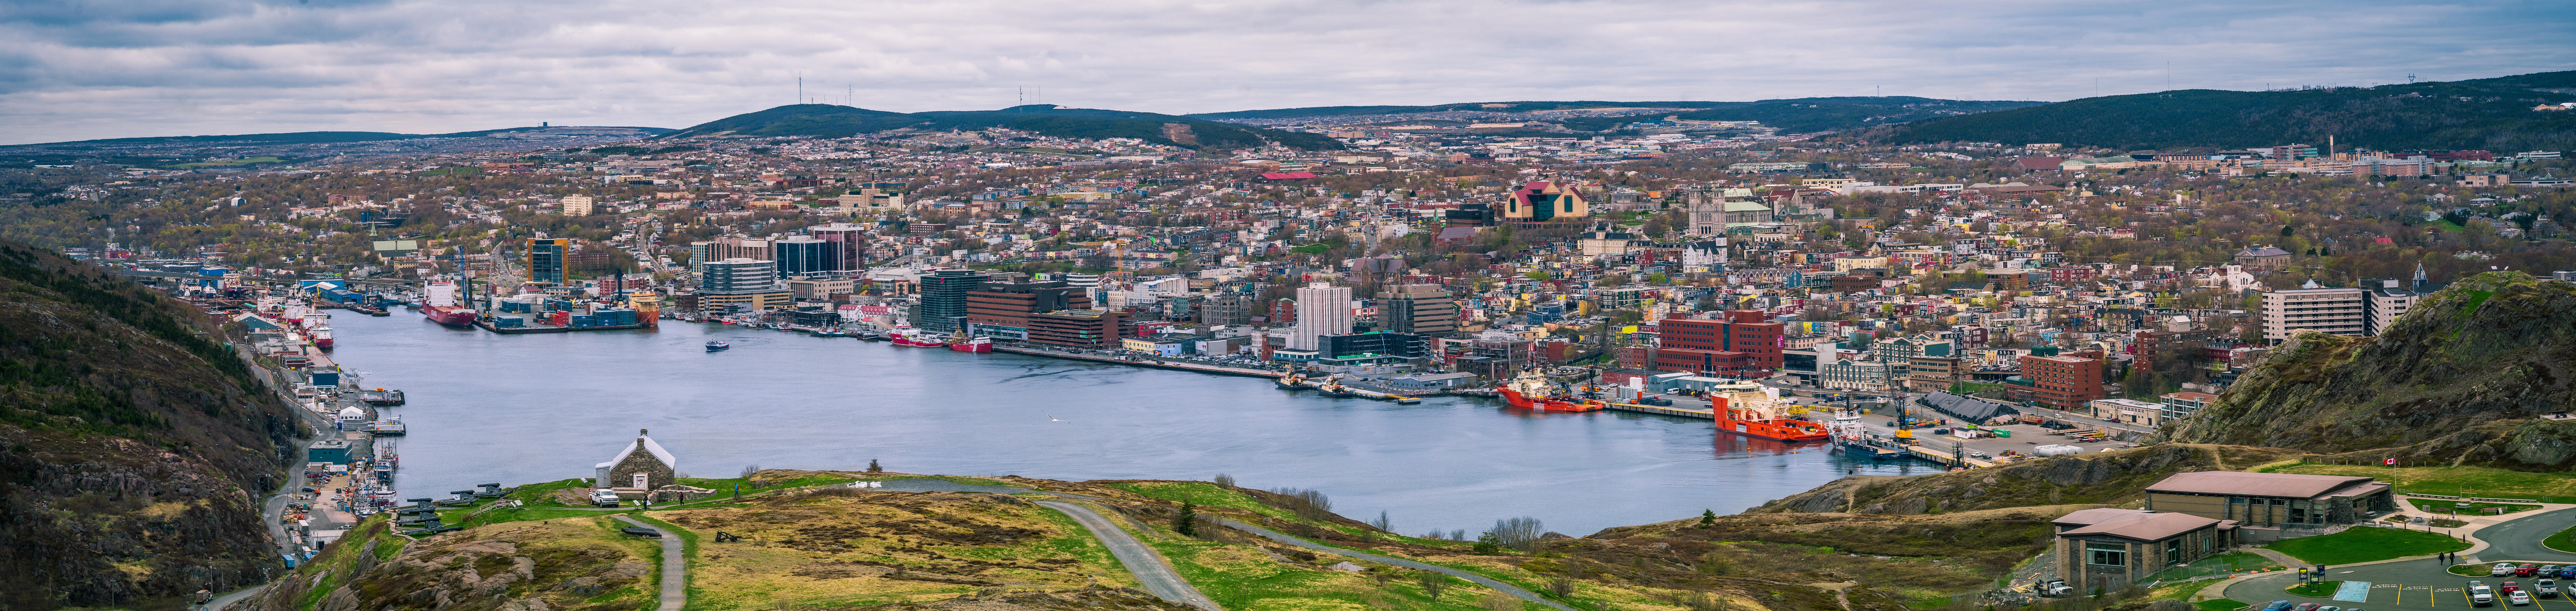 File:St. John's, Newfoundland and Labrador, Canada.jpg - Wikimedia ...